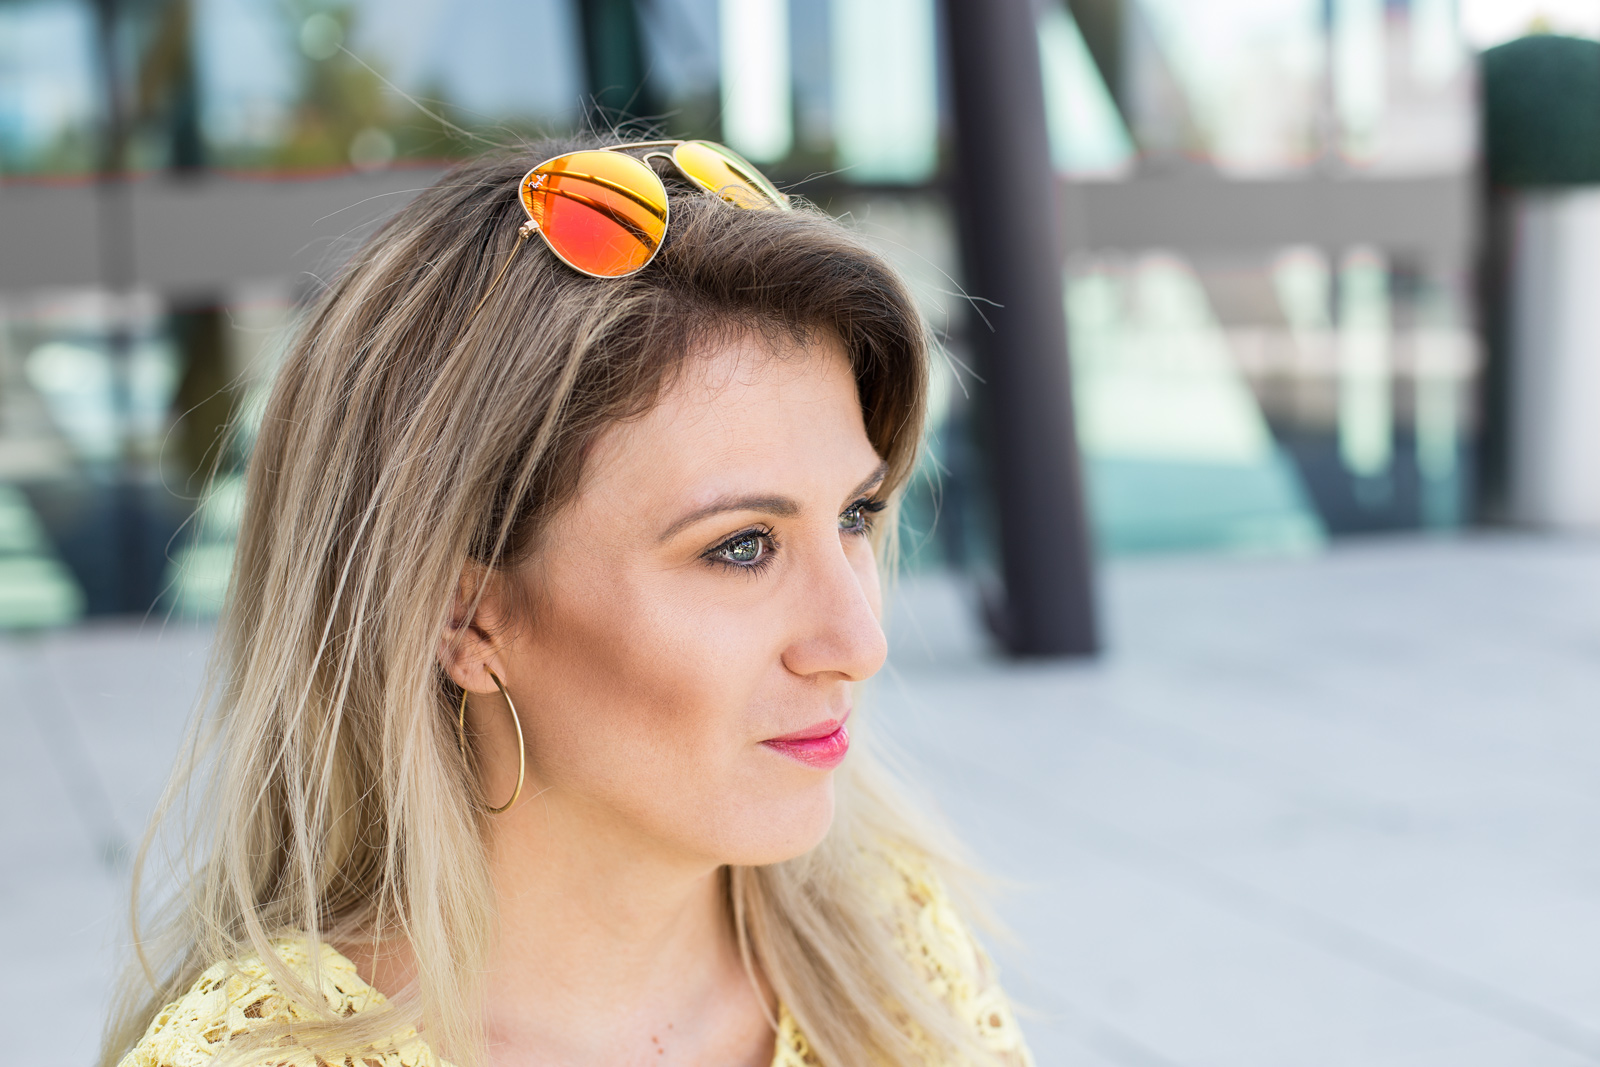 Foto_by_Nadja_Nemetz_Wien_Outfit_Fashion_Mode_Modeblogger_Blogger_RayBan_3